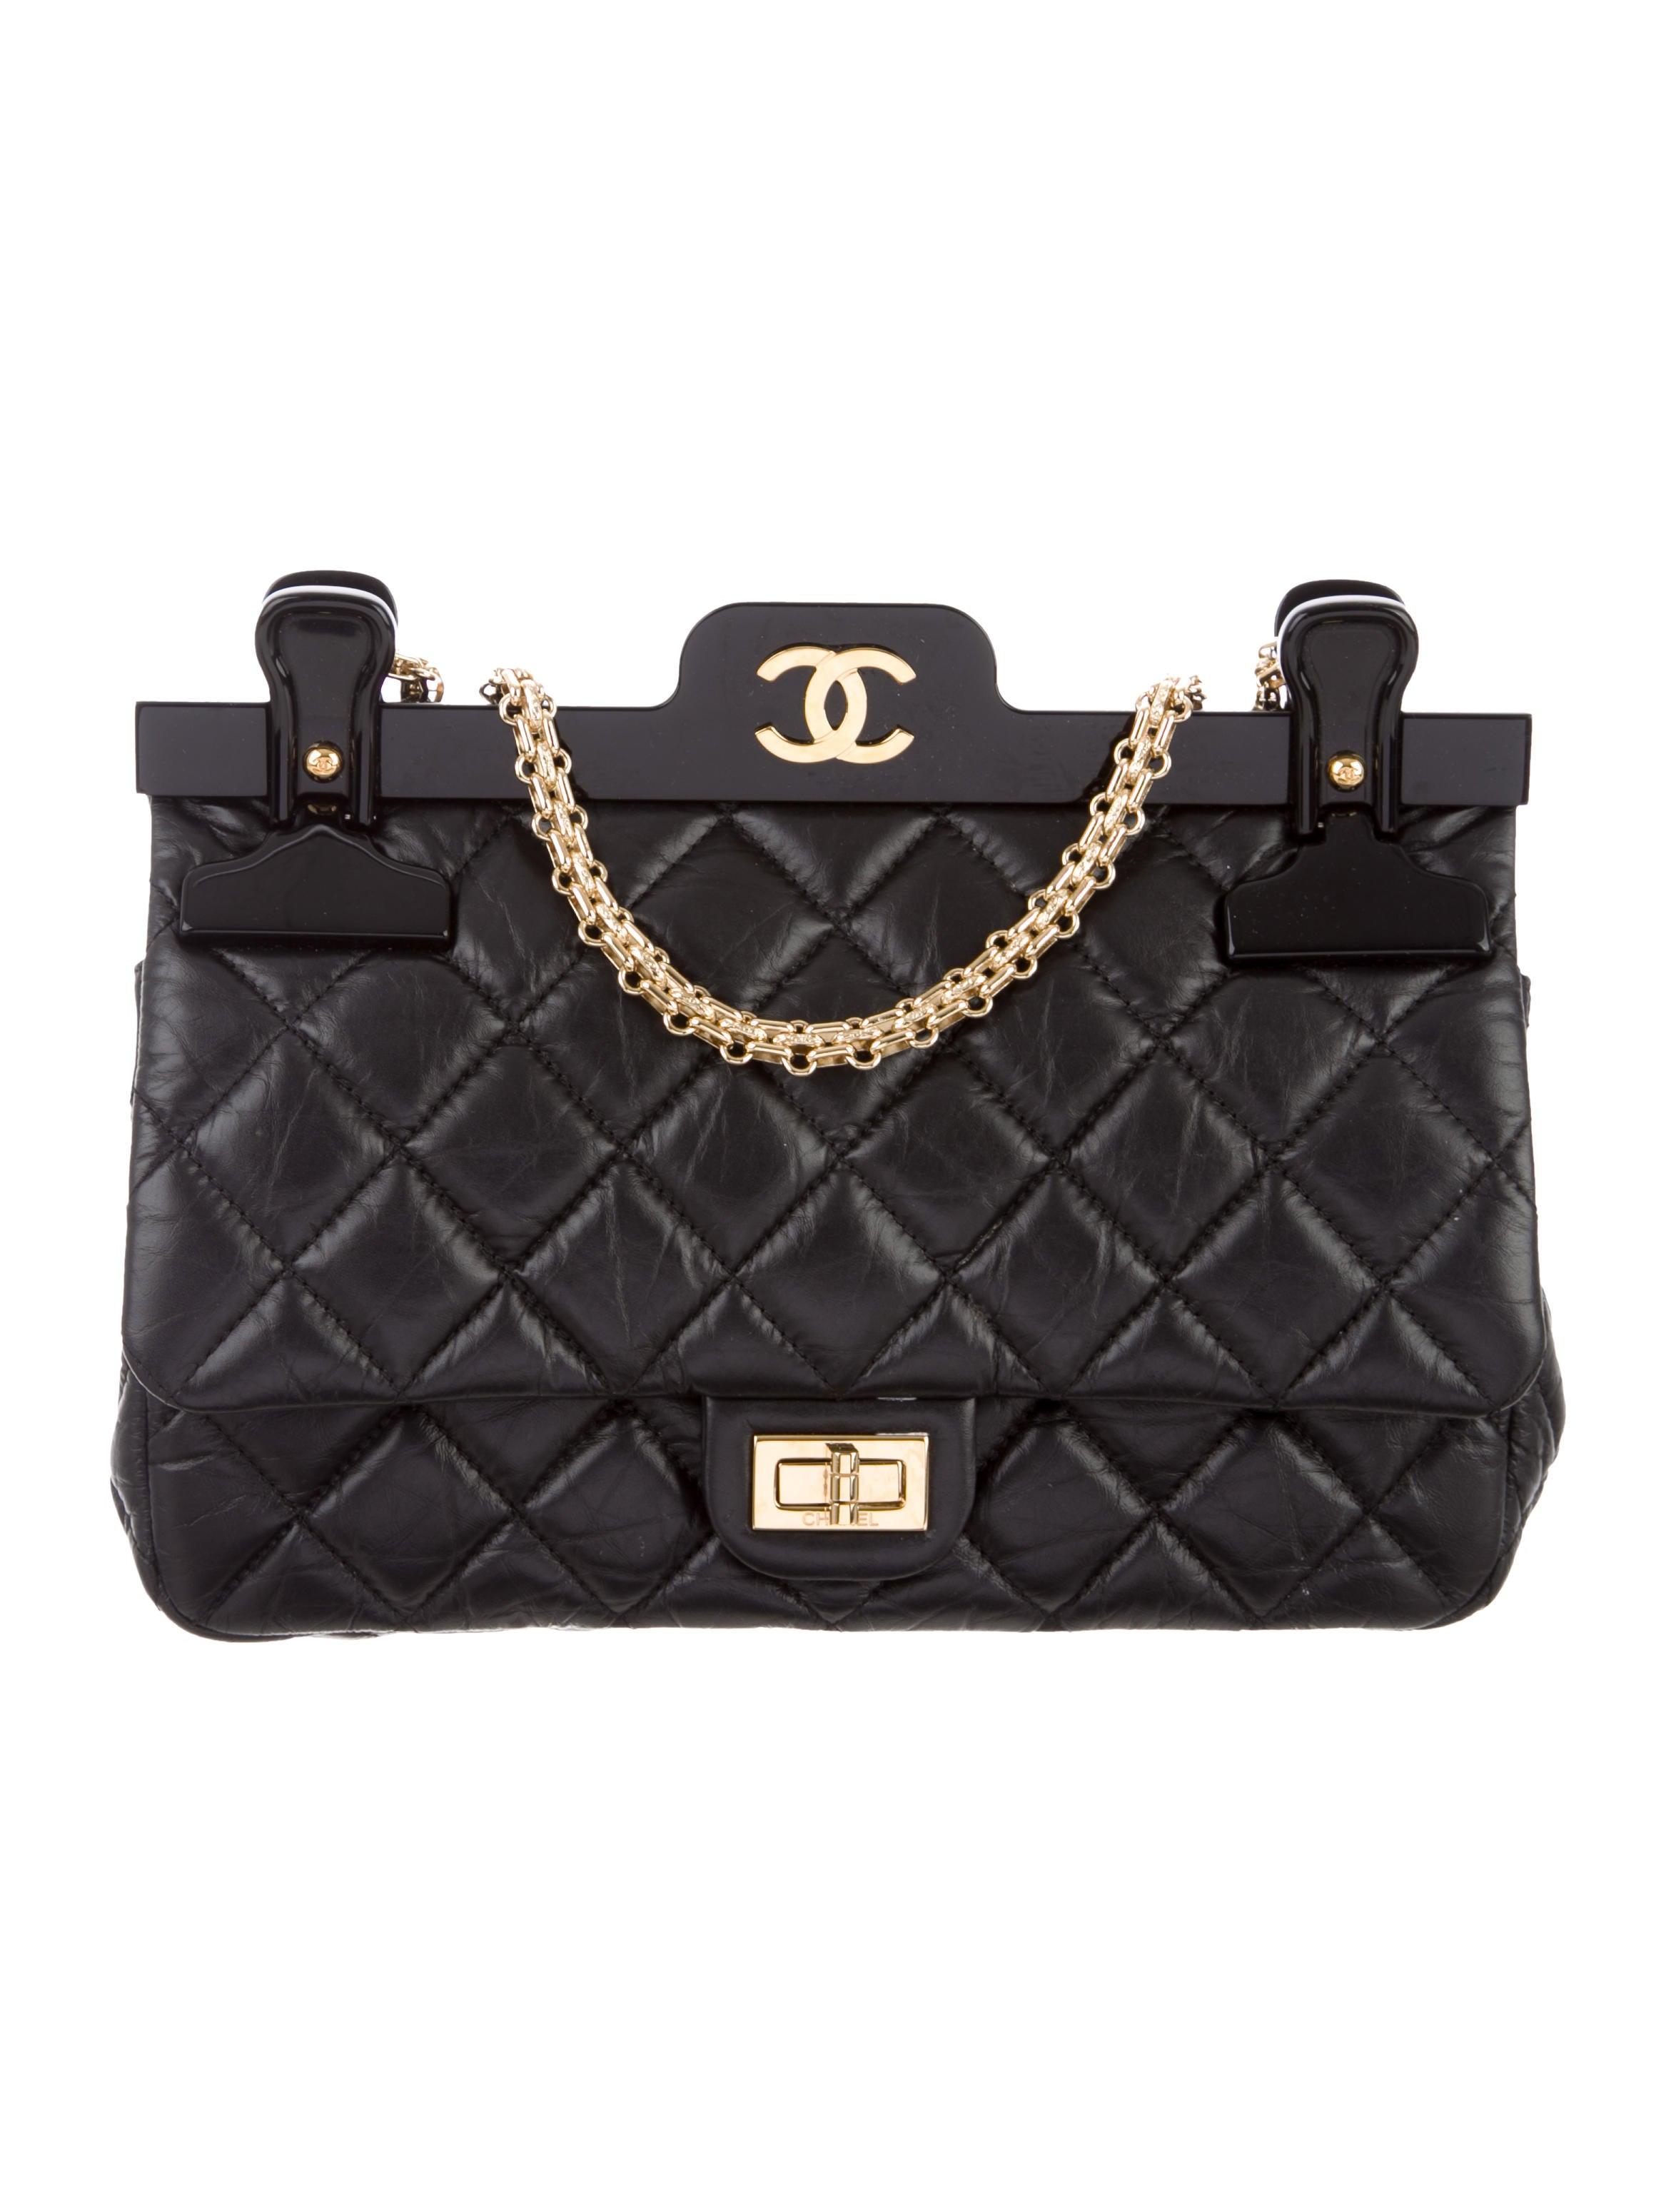 ee8683042f6f Chanel 2.55 Reissue Large Hanger Flap Bag - Handbags - CHA275370 ...